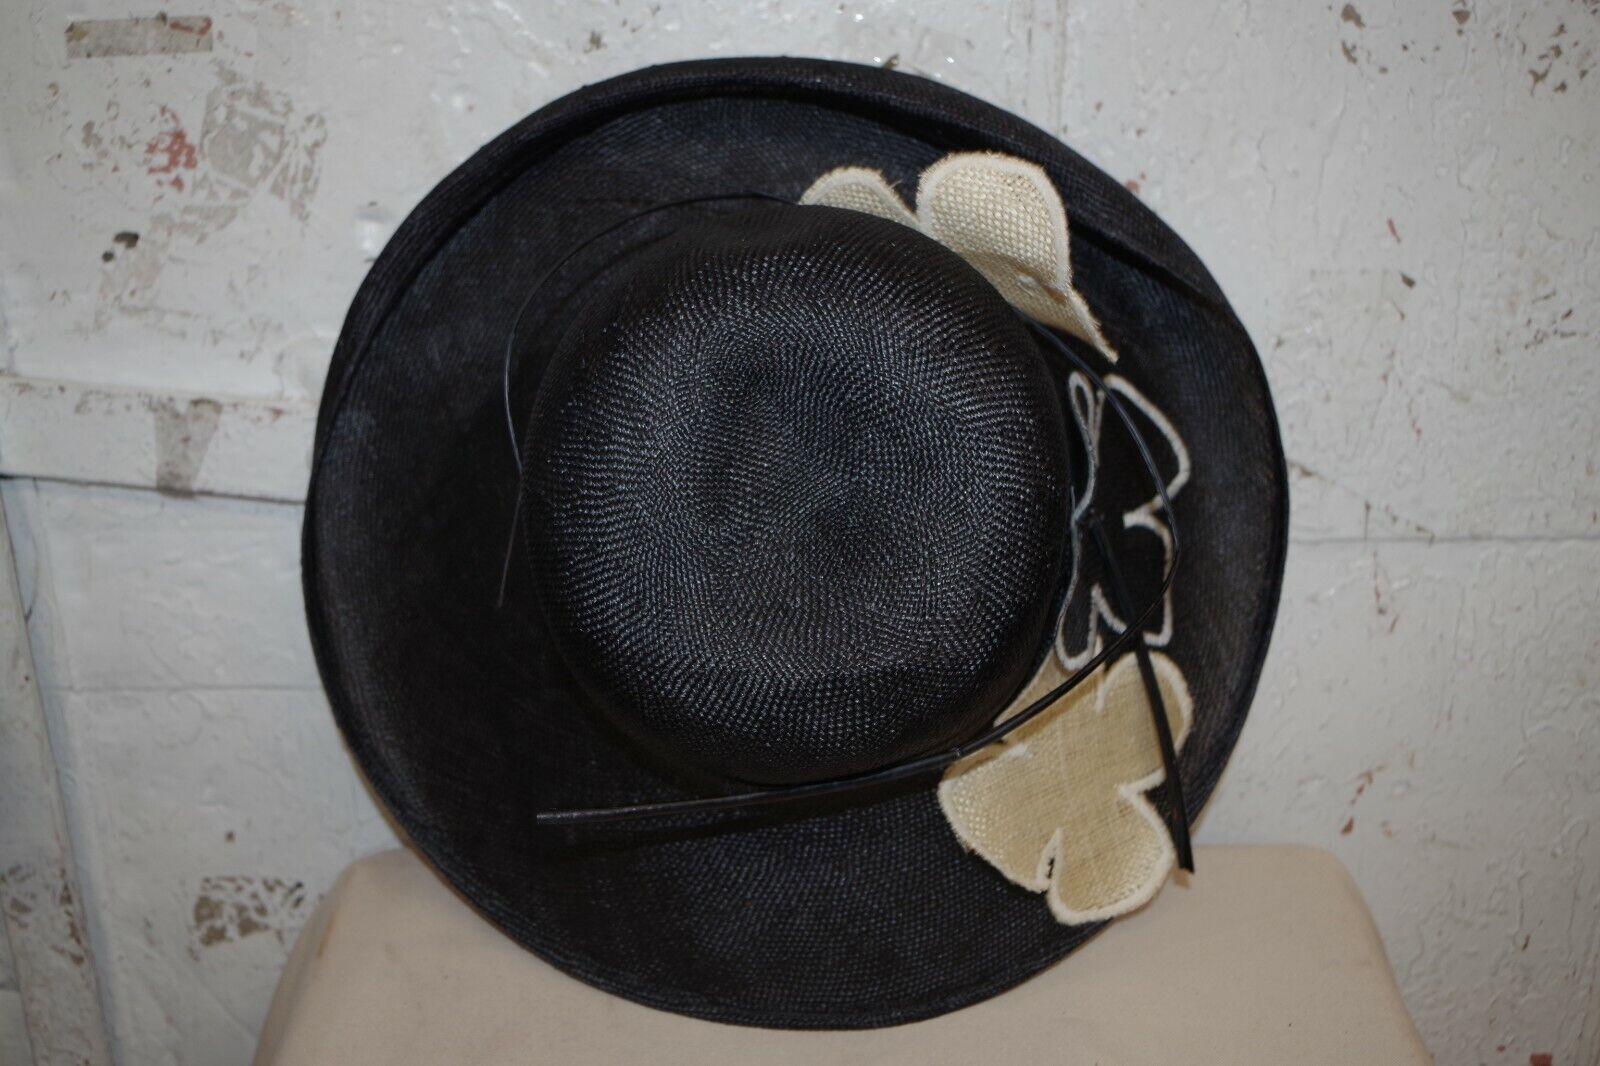 MEDICI WIDE BRIM STRAW HAT WIDE BRIM BLACK & TAN … - image 11